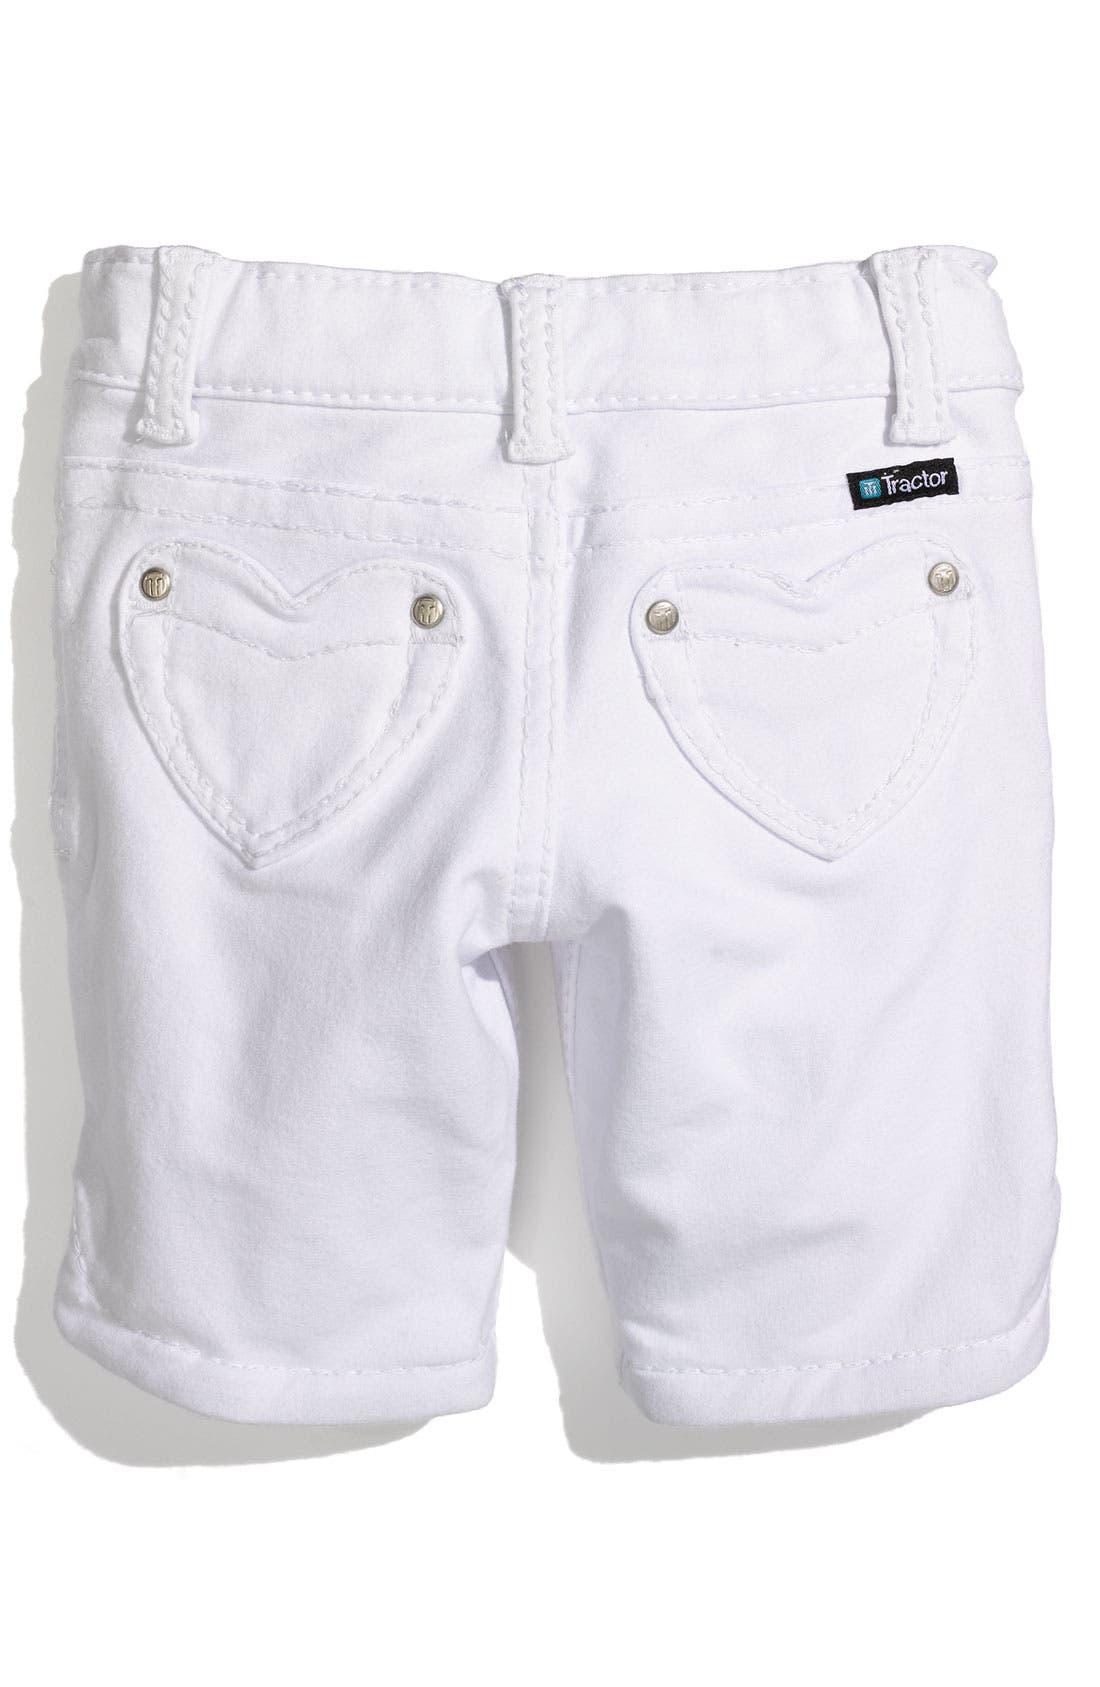 TRACTR Heart Pocket Bermuda Shorts, Main, color, 100